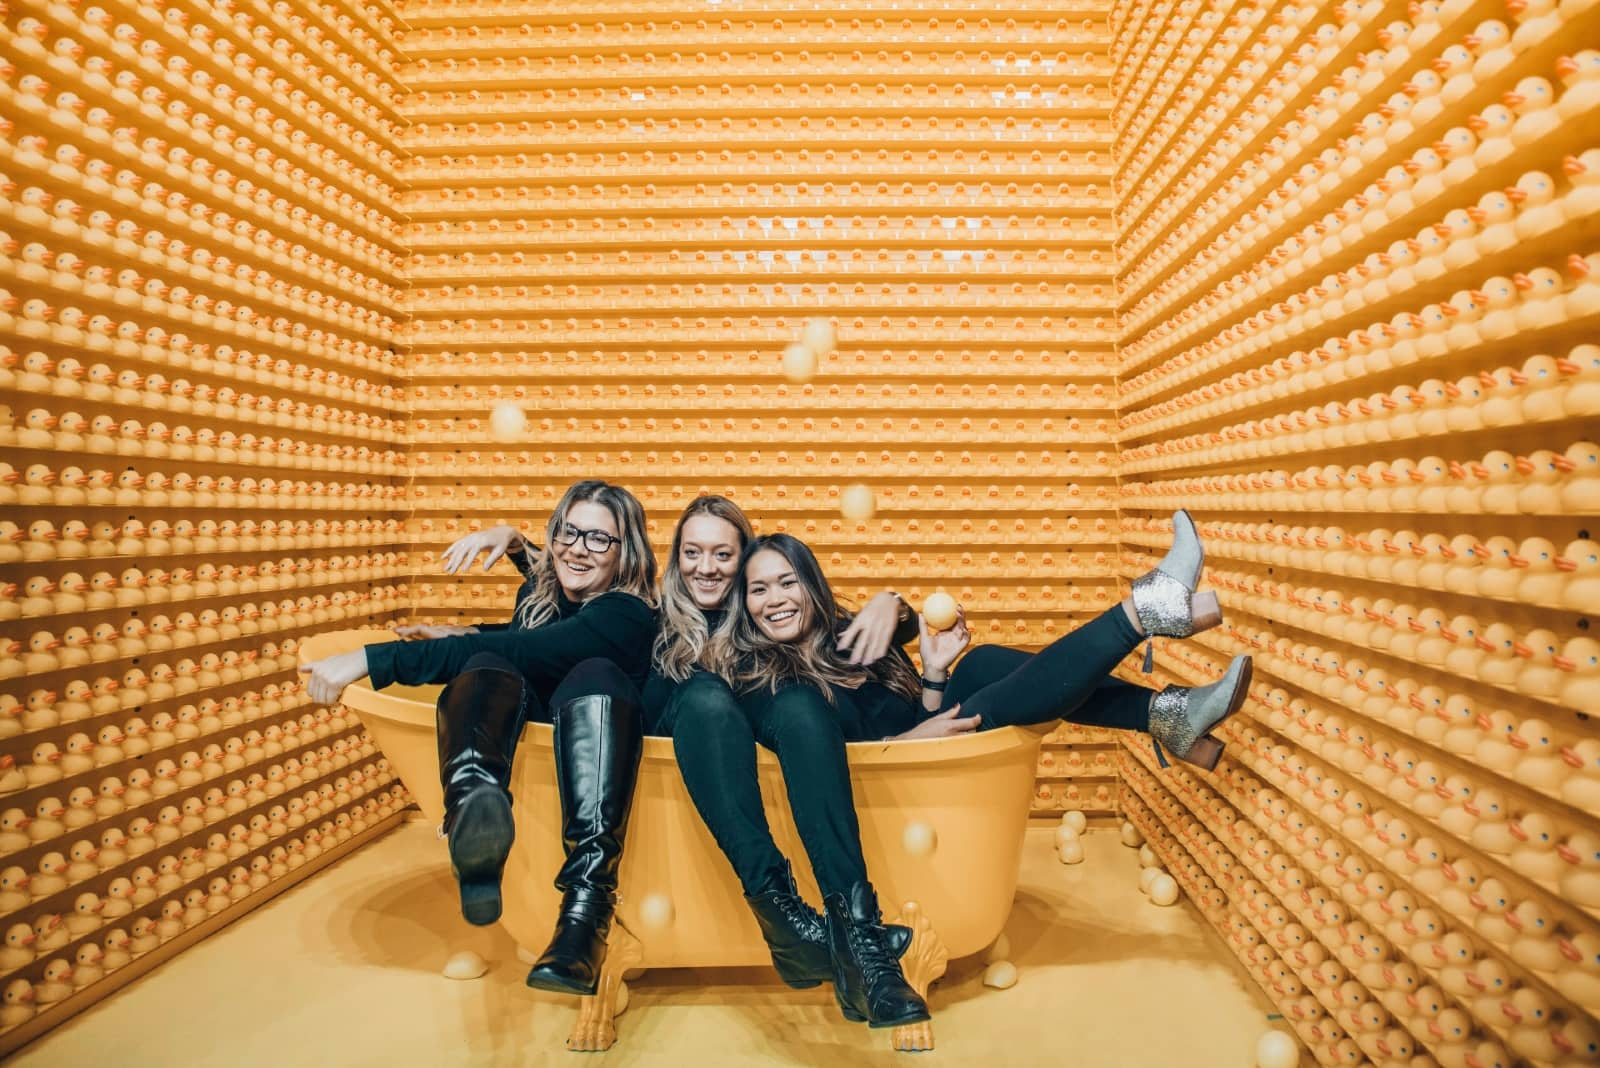 three women smiling while sitting in orange bathtub